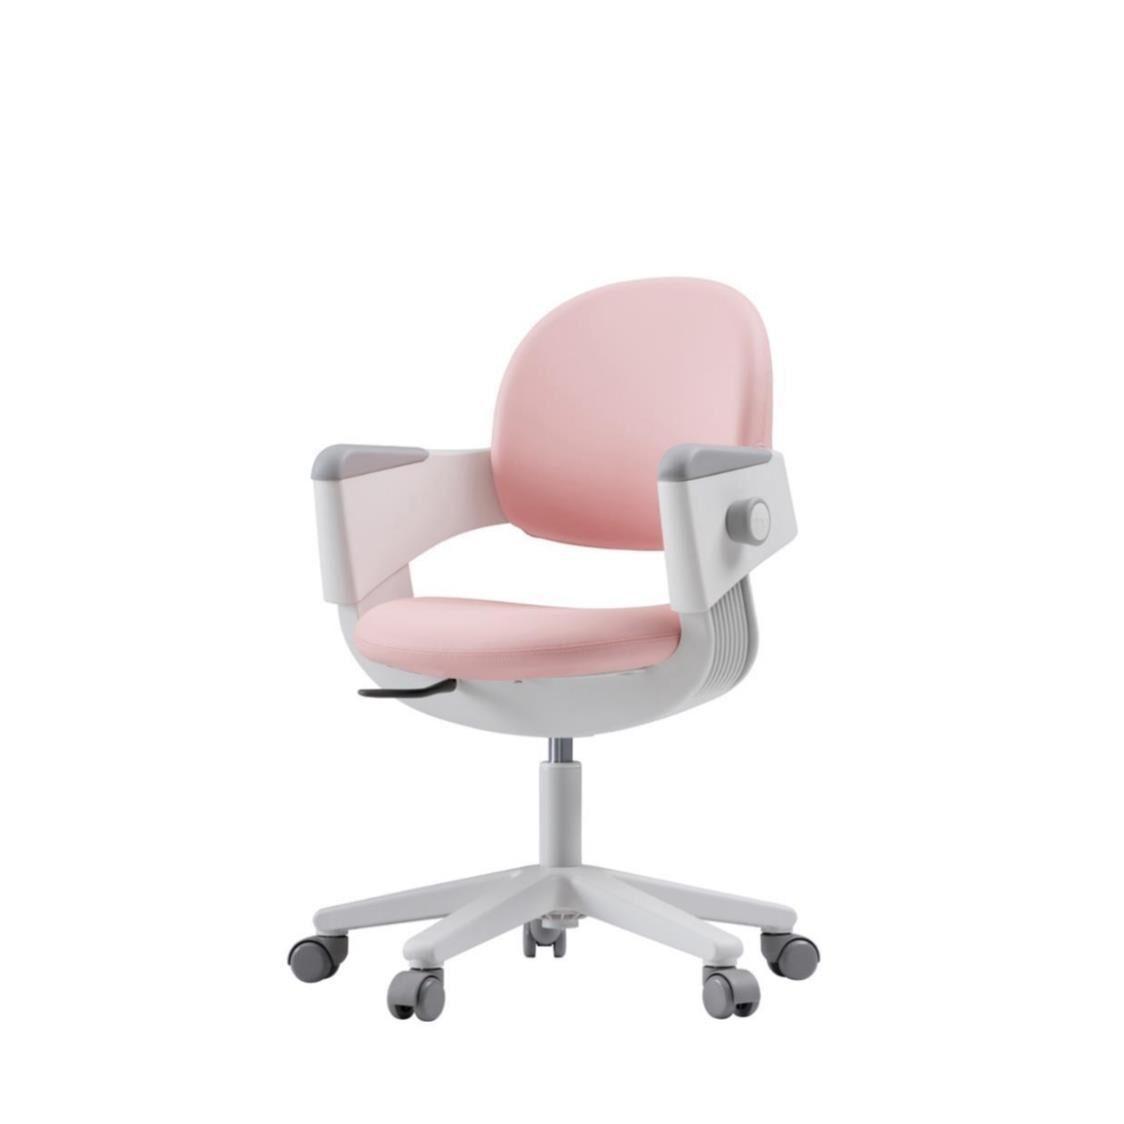 Iloom Ringo-I Fixed A443P Pastel Pink